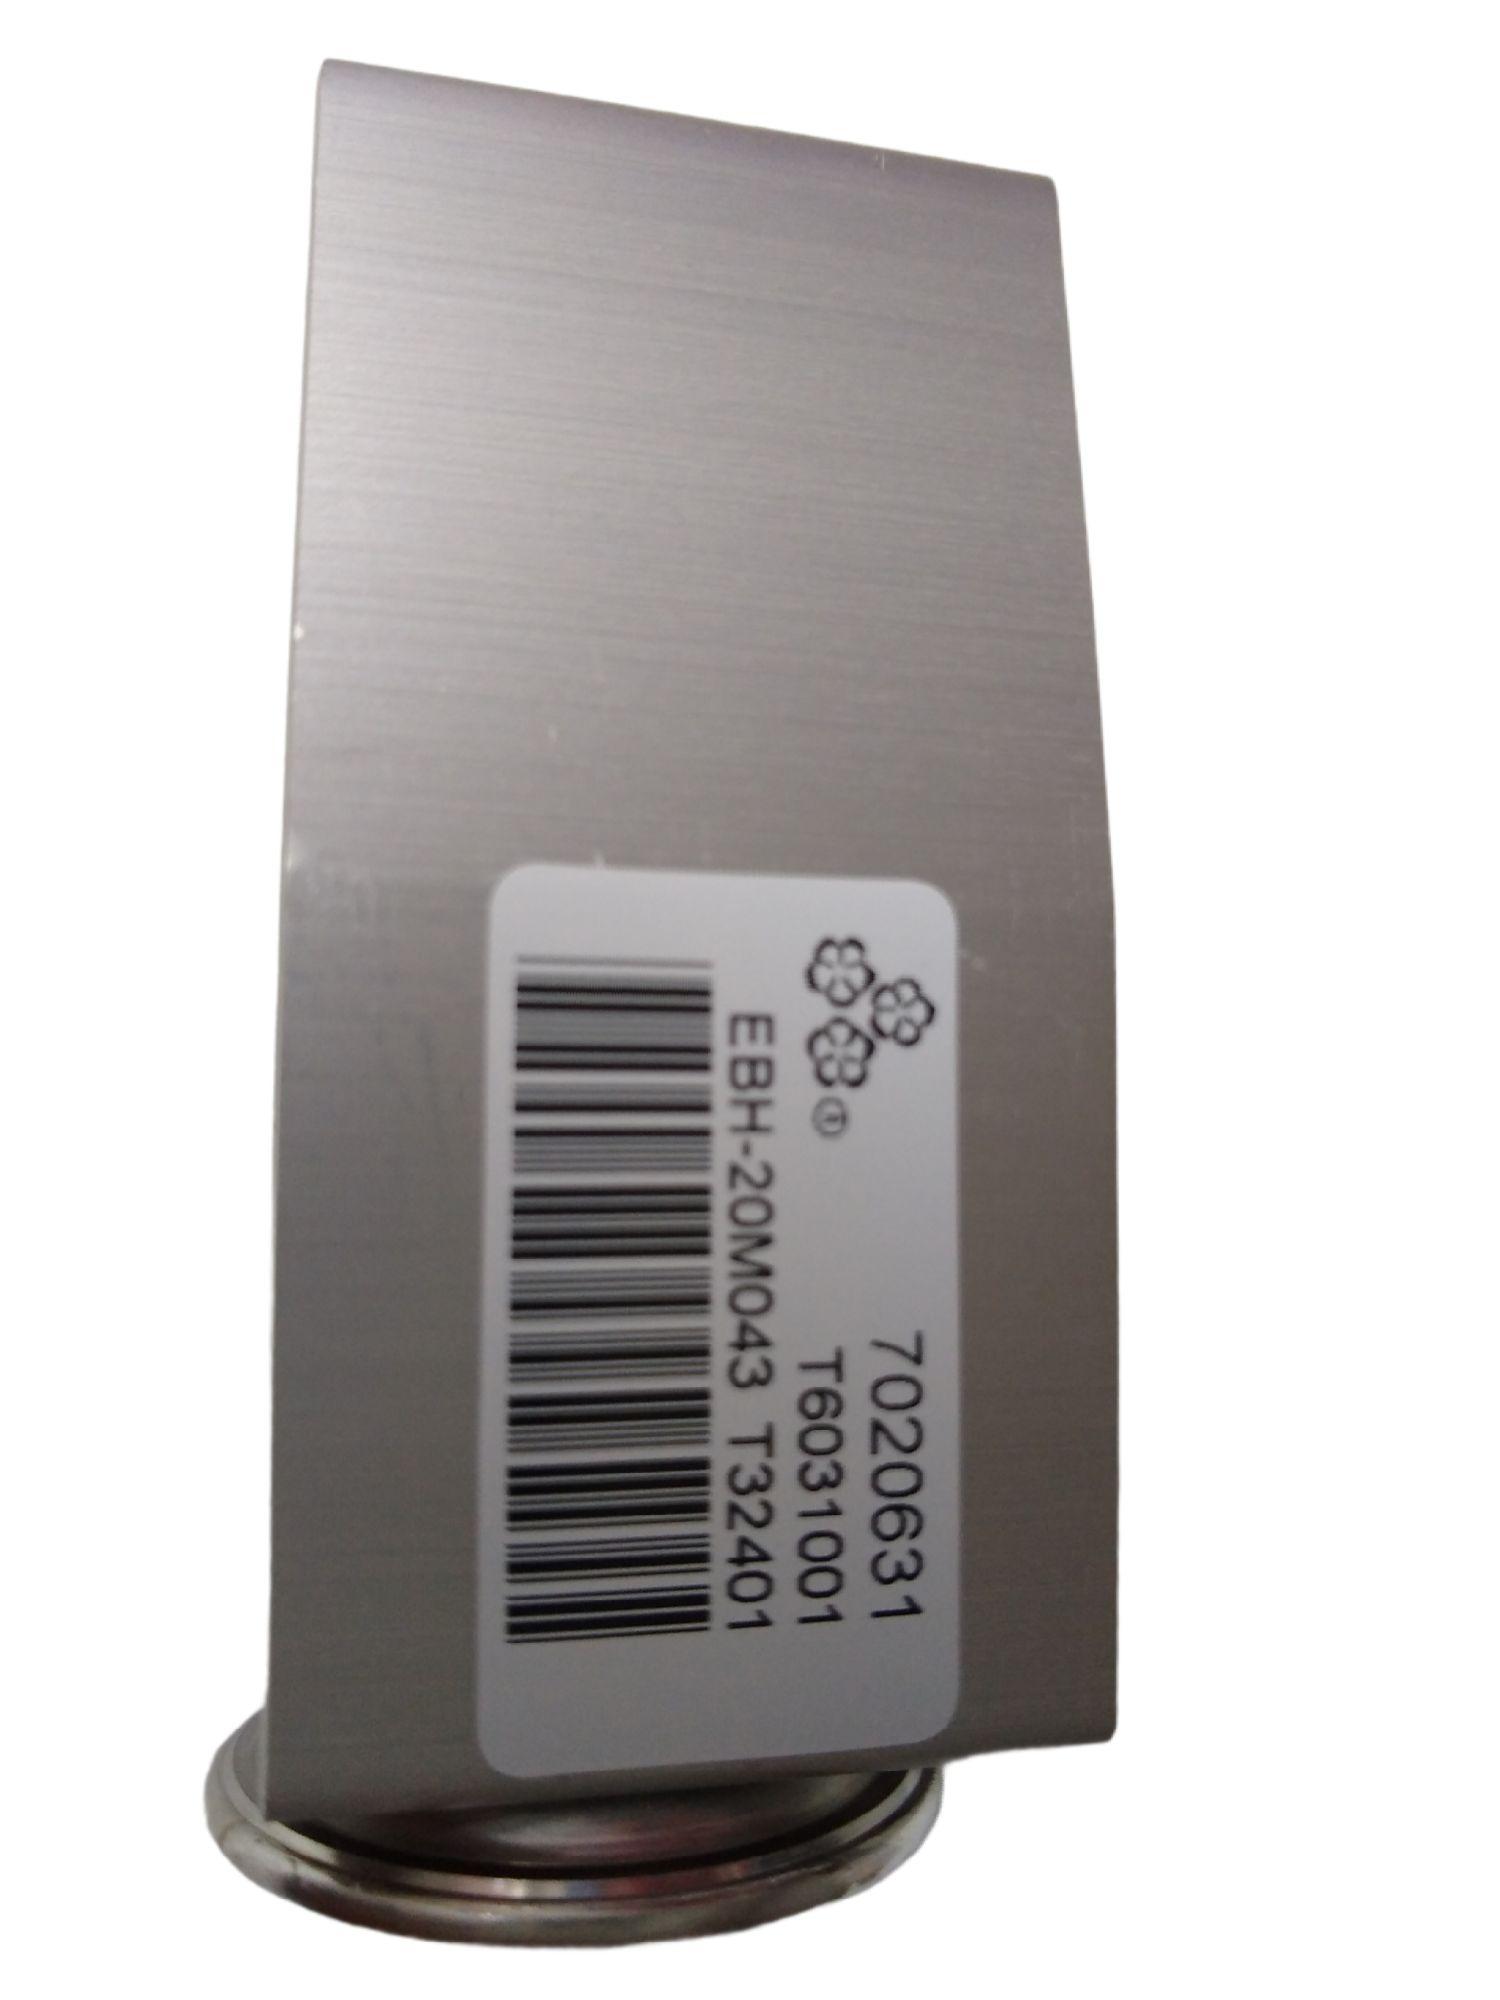 AVE 134 000P VALVULA EXPANSÃO  AGILE ONIX COBALT SPIN PRISMA ECOSPORT KA